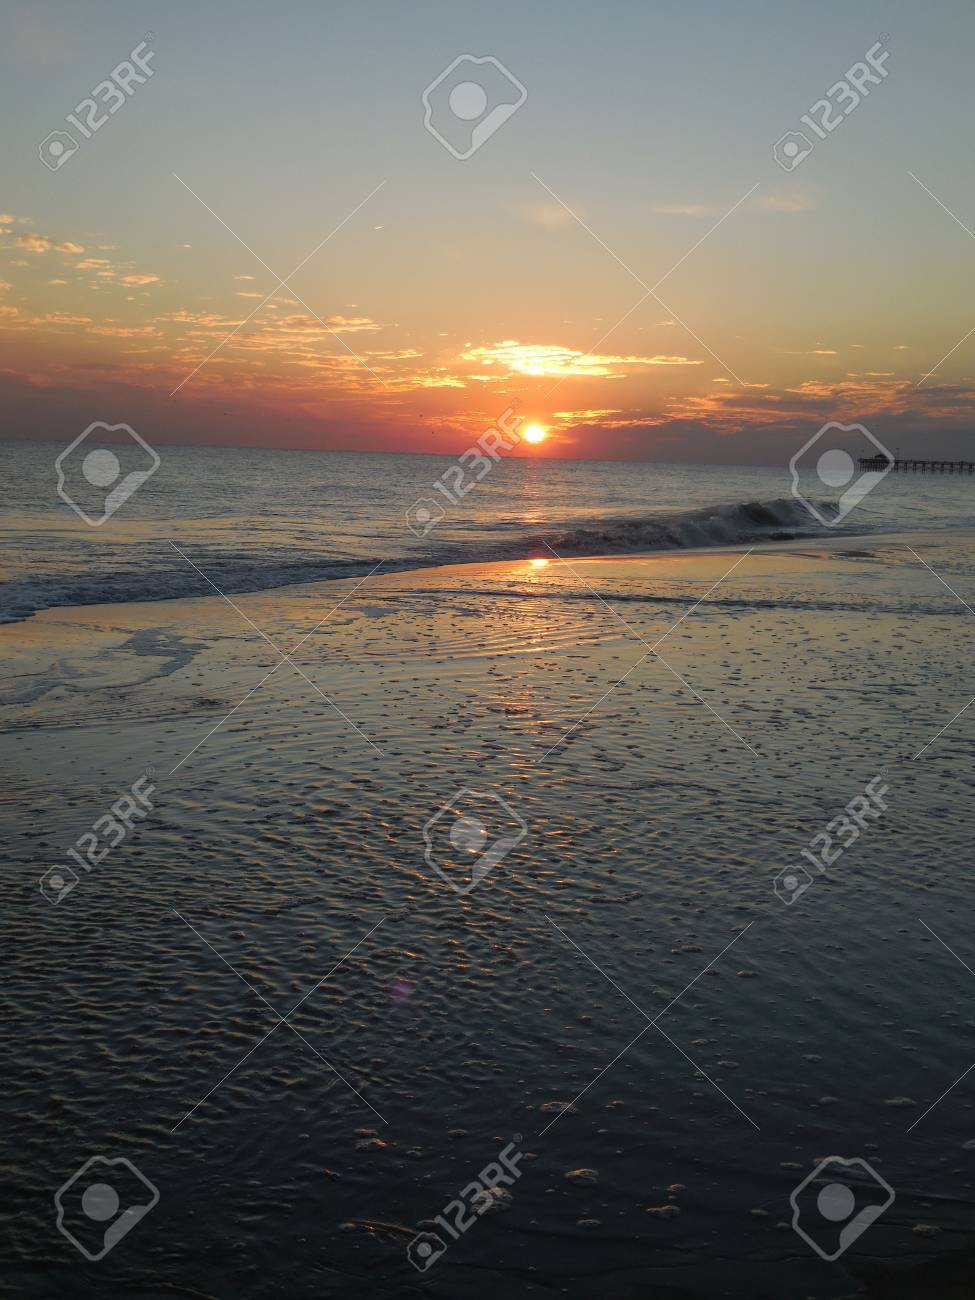 Sunset at the beach Stock Photo - 73746421